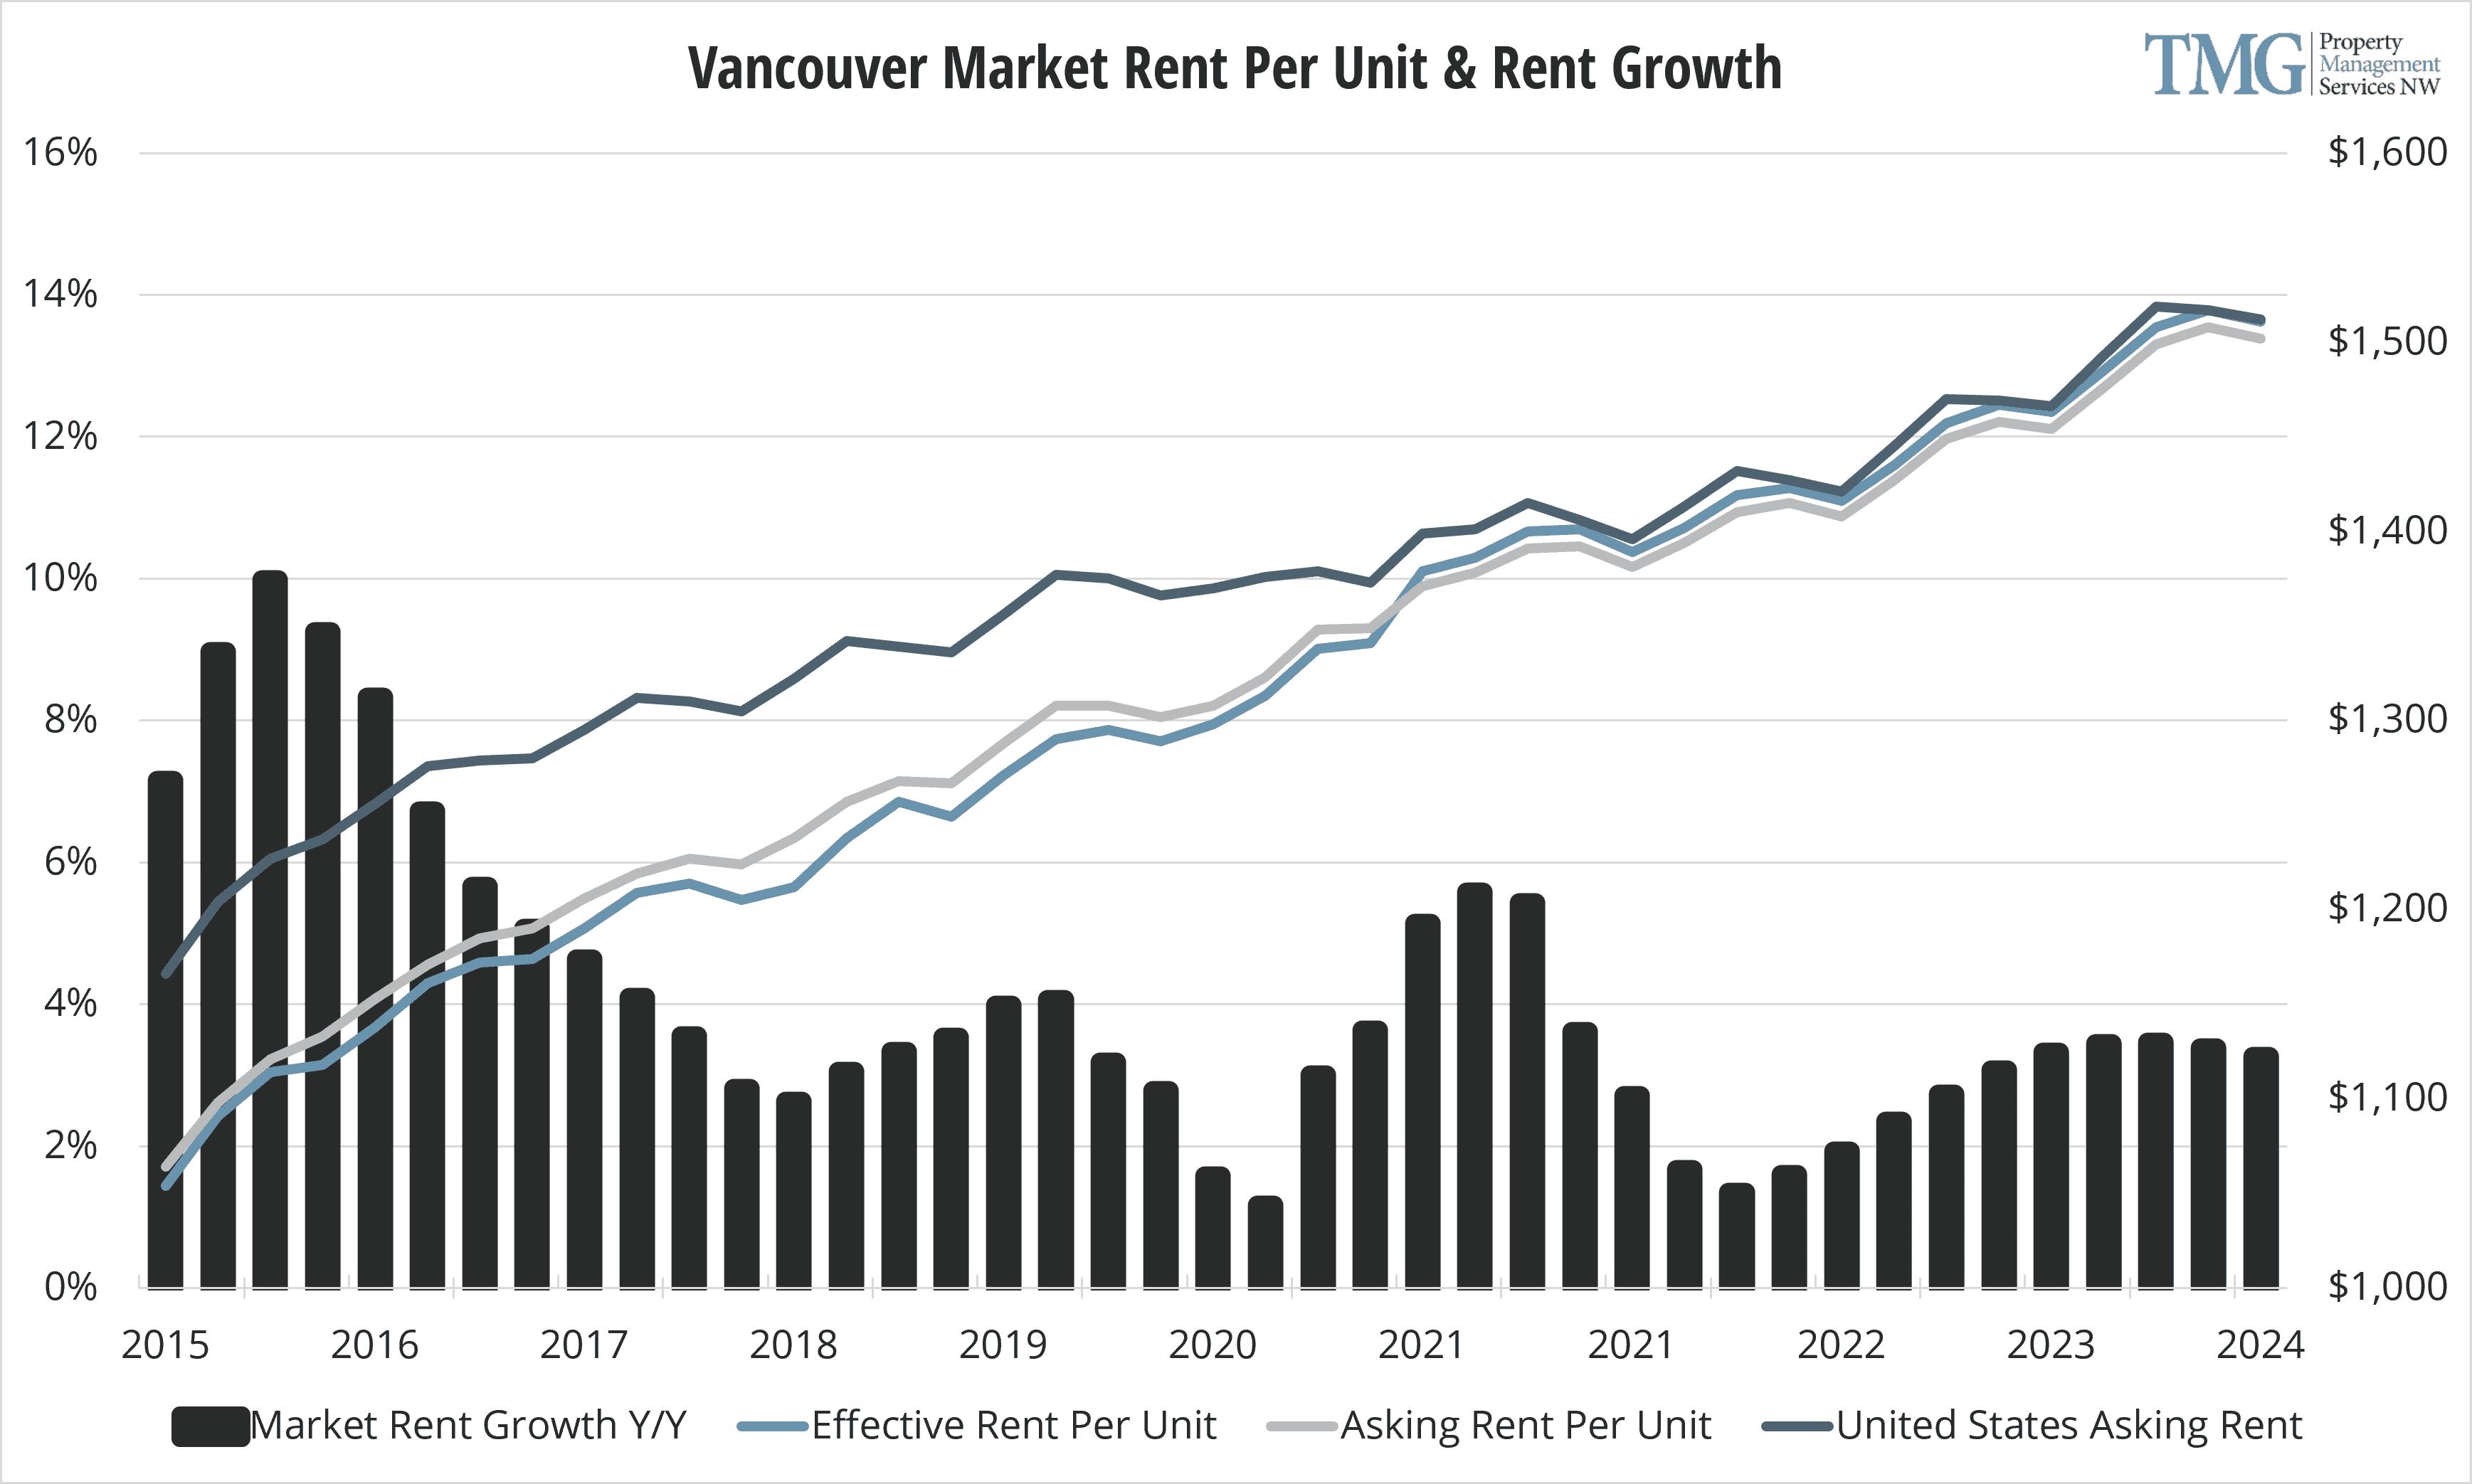 Vancouver Q1 2021 Market Rent Per Unit & Rent Growth